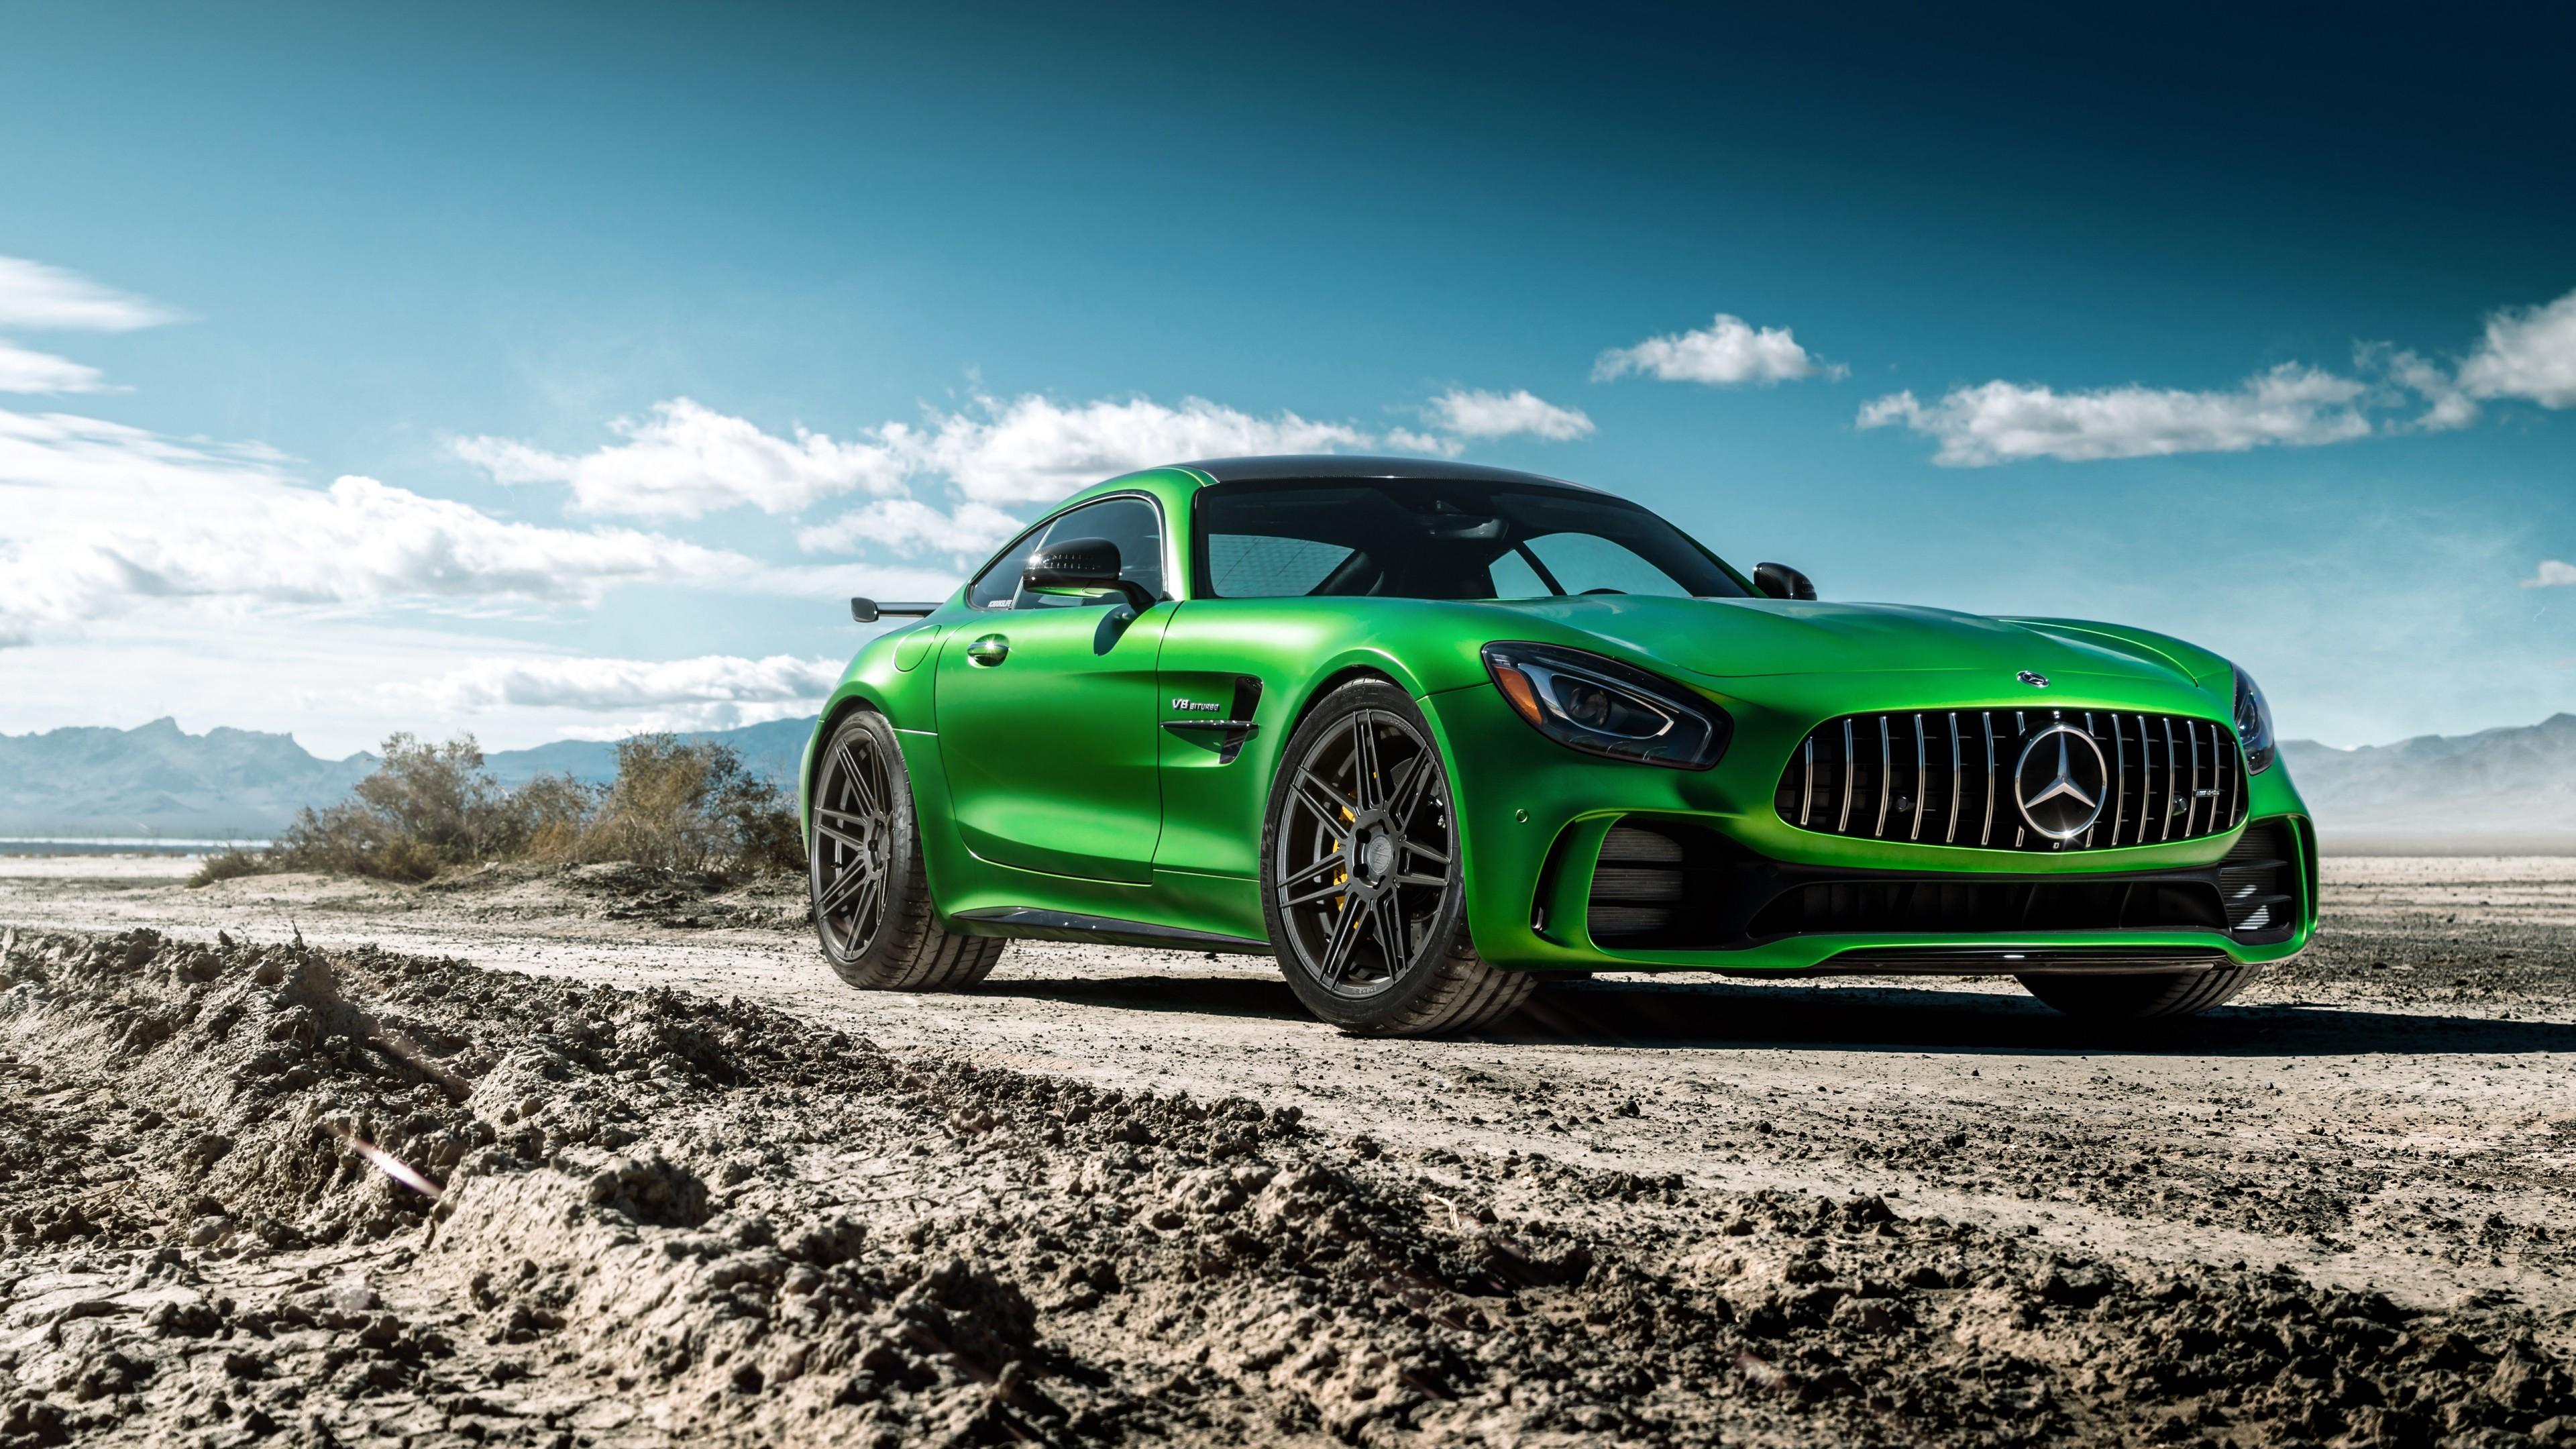 Ferrada Sema Green Mercedes Gtr 5k Wallpaper Hd Car